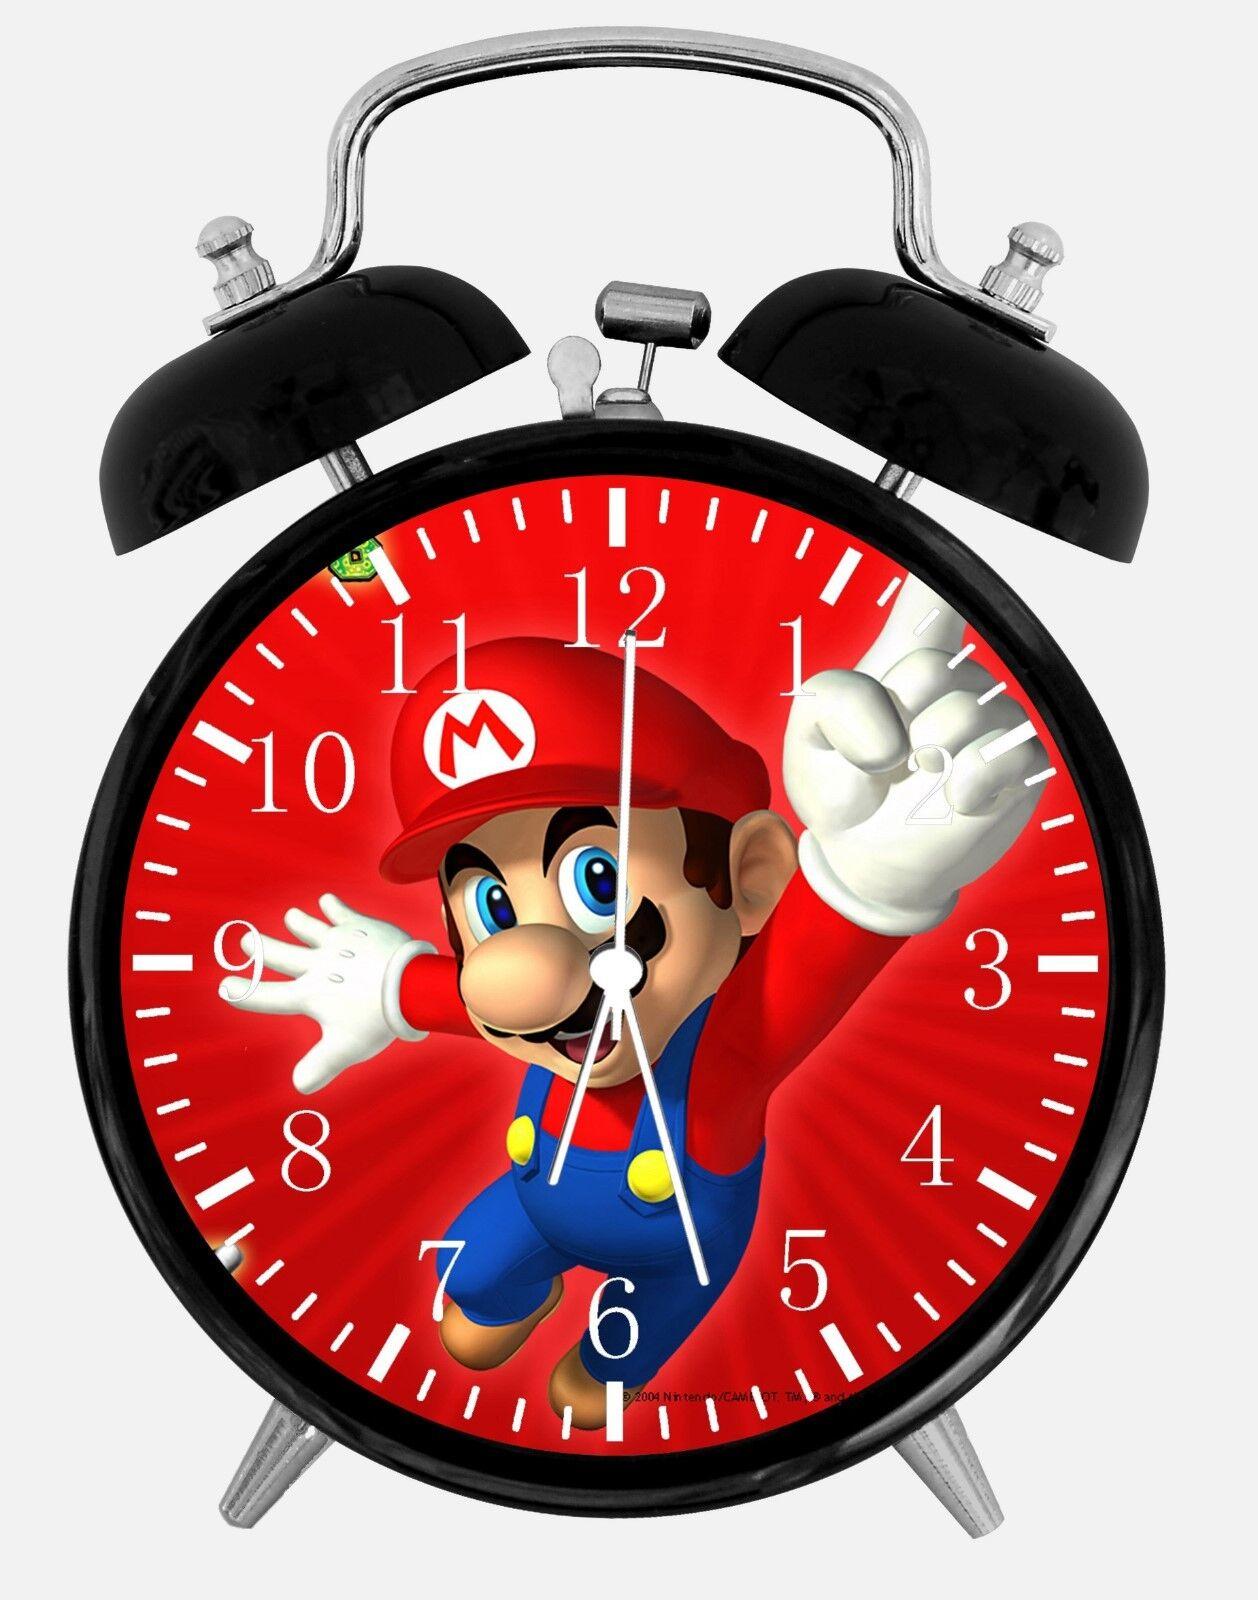 "Super Mario Alarm Desk Clock 3.75"" Room Office Decor W08 Will Be a Nice Gift"